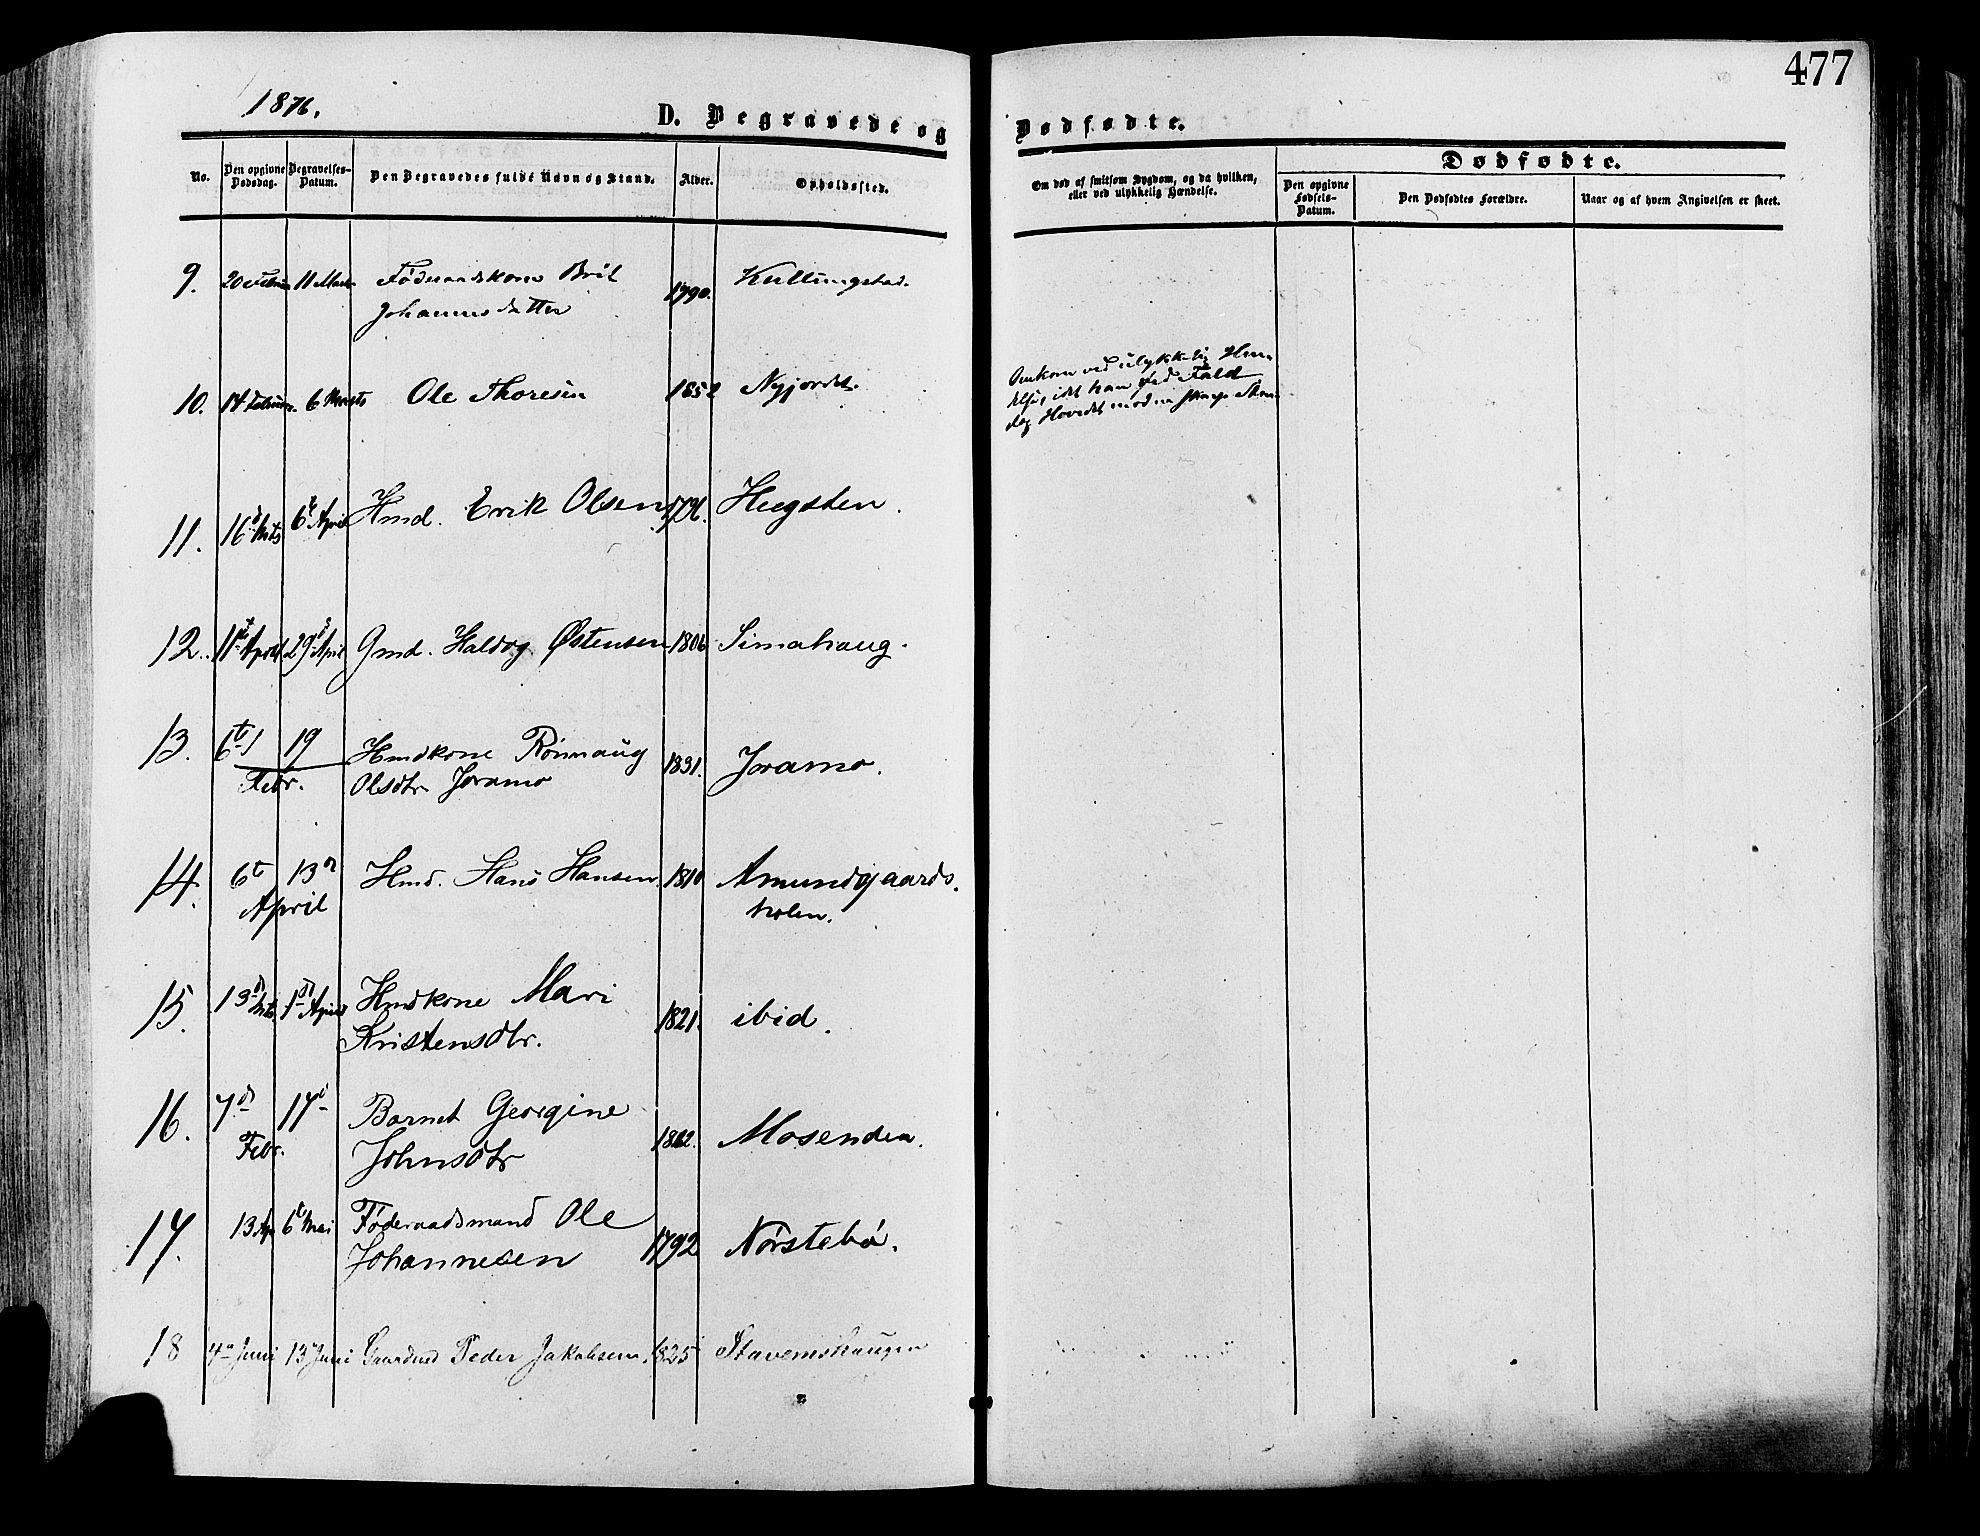 SAH, Lesja prestekontor, Ministerialbok nr. 8, 1854-1880, s. 477